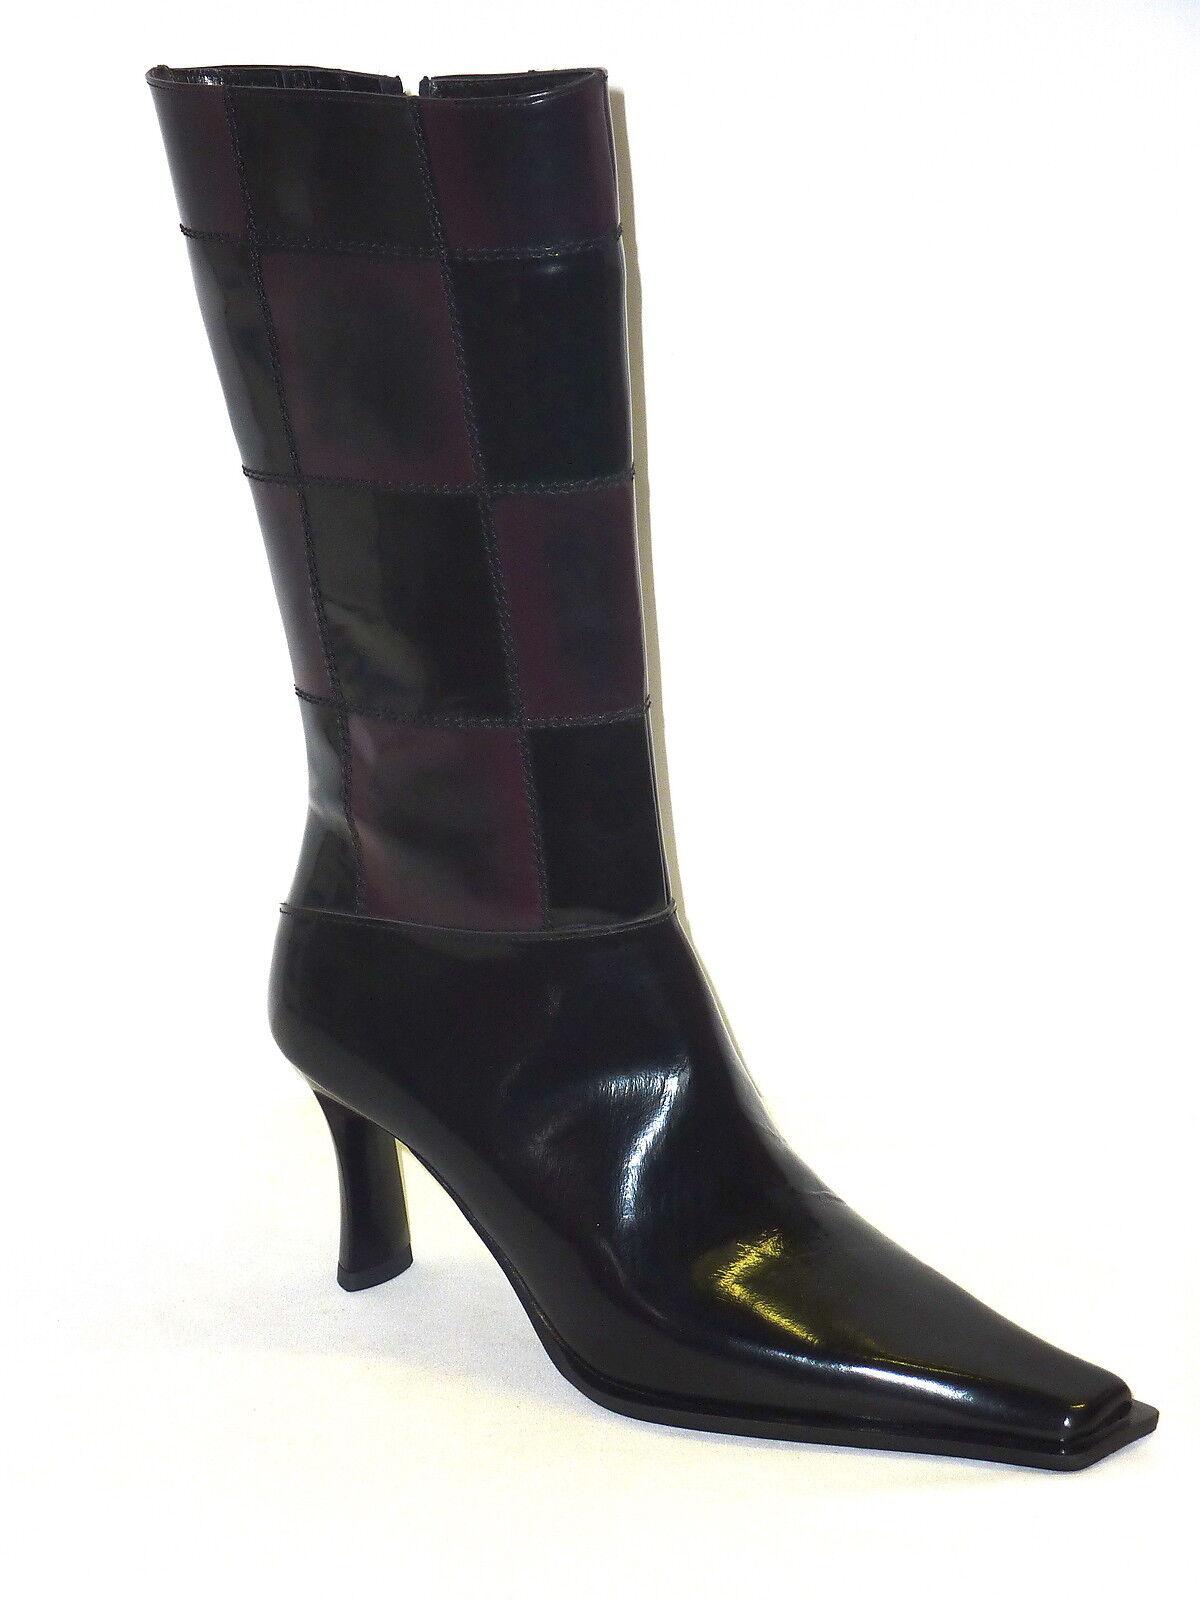 ILIAN FOSSA' bottes femmes STIVALETTI PELLE VERNICE chaussures MODA noir-BORDO' 36